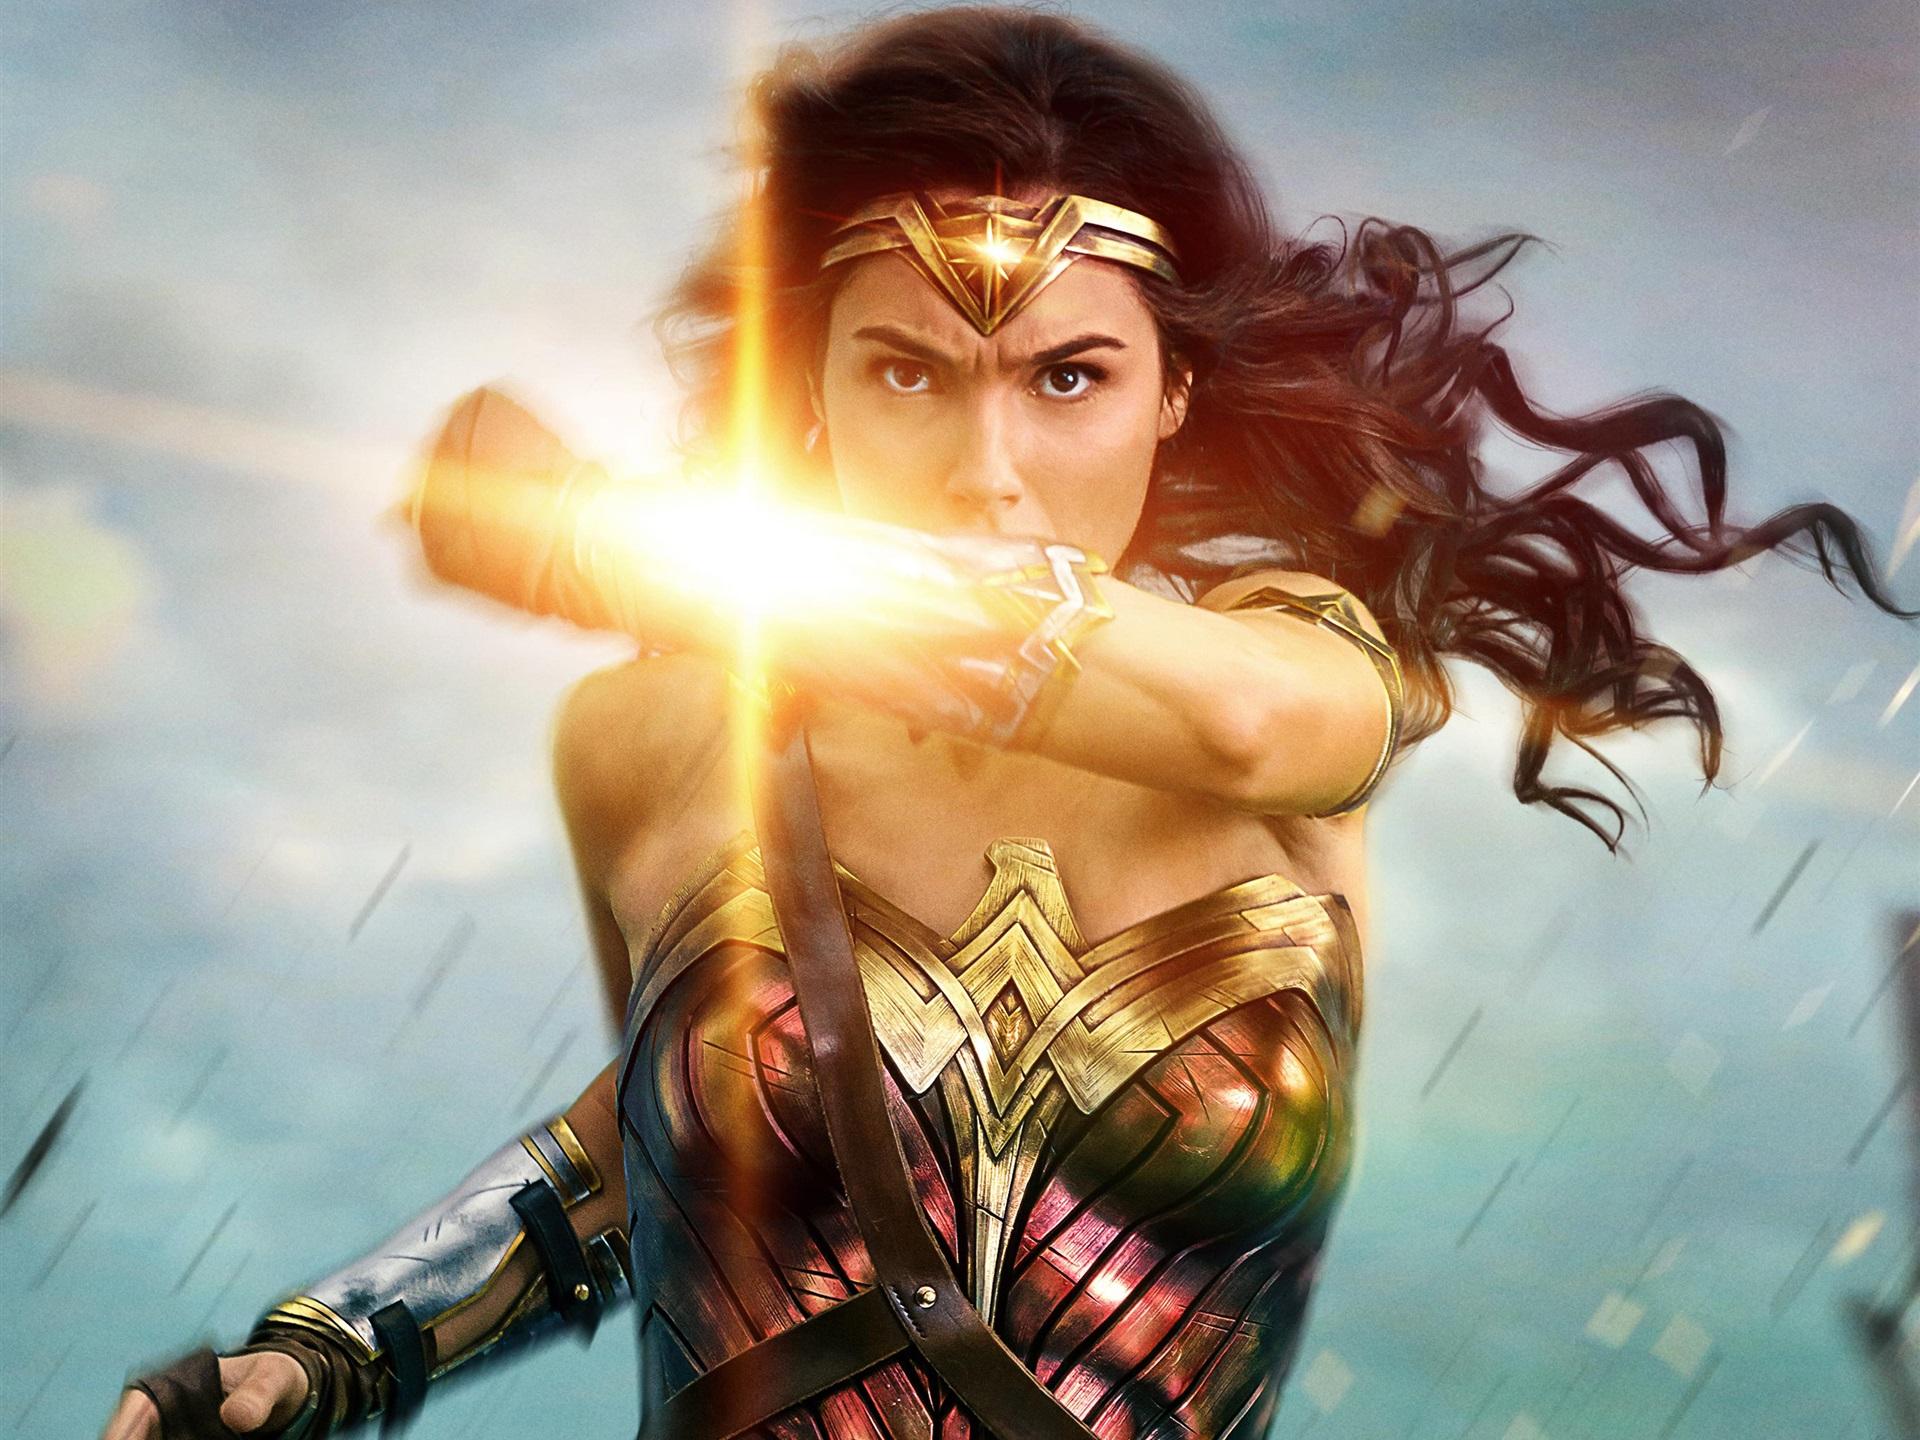 Diana Prince (Wonder Woman)